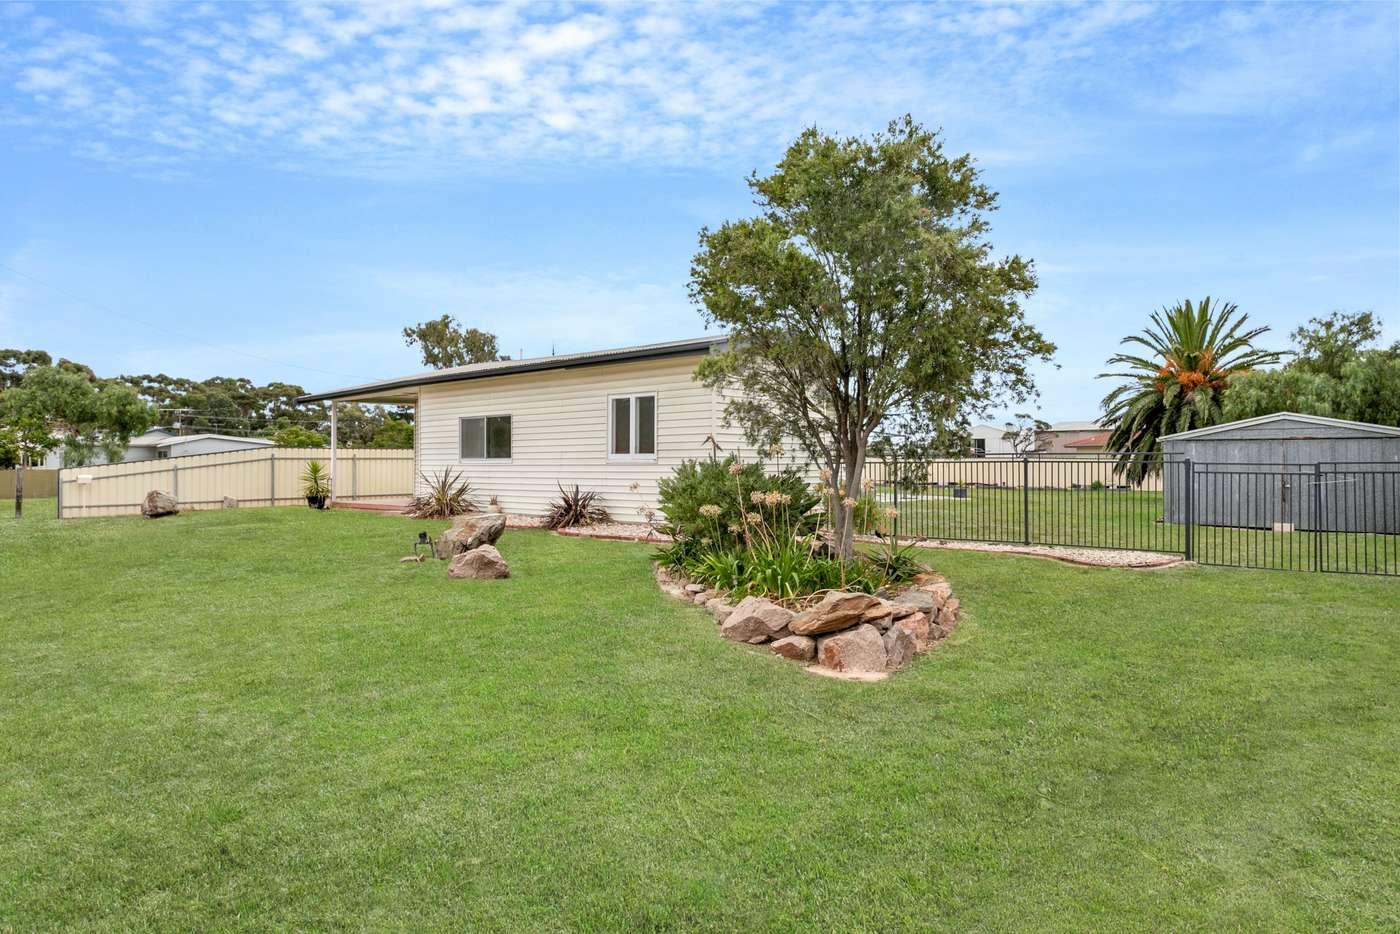 Main view of Homely house listing, 41 Falkner Street, Meningie SA 5264